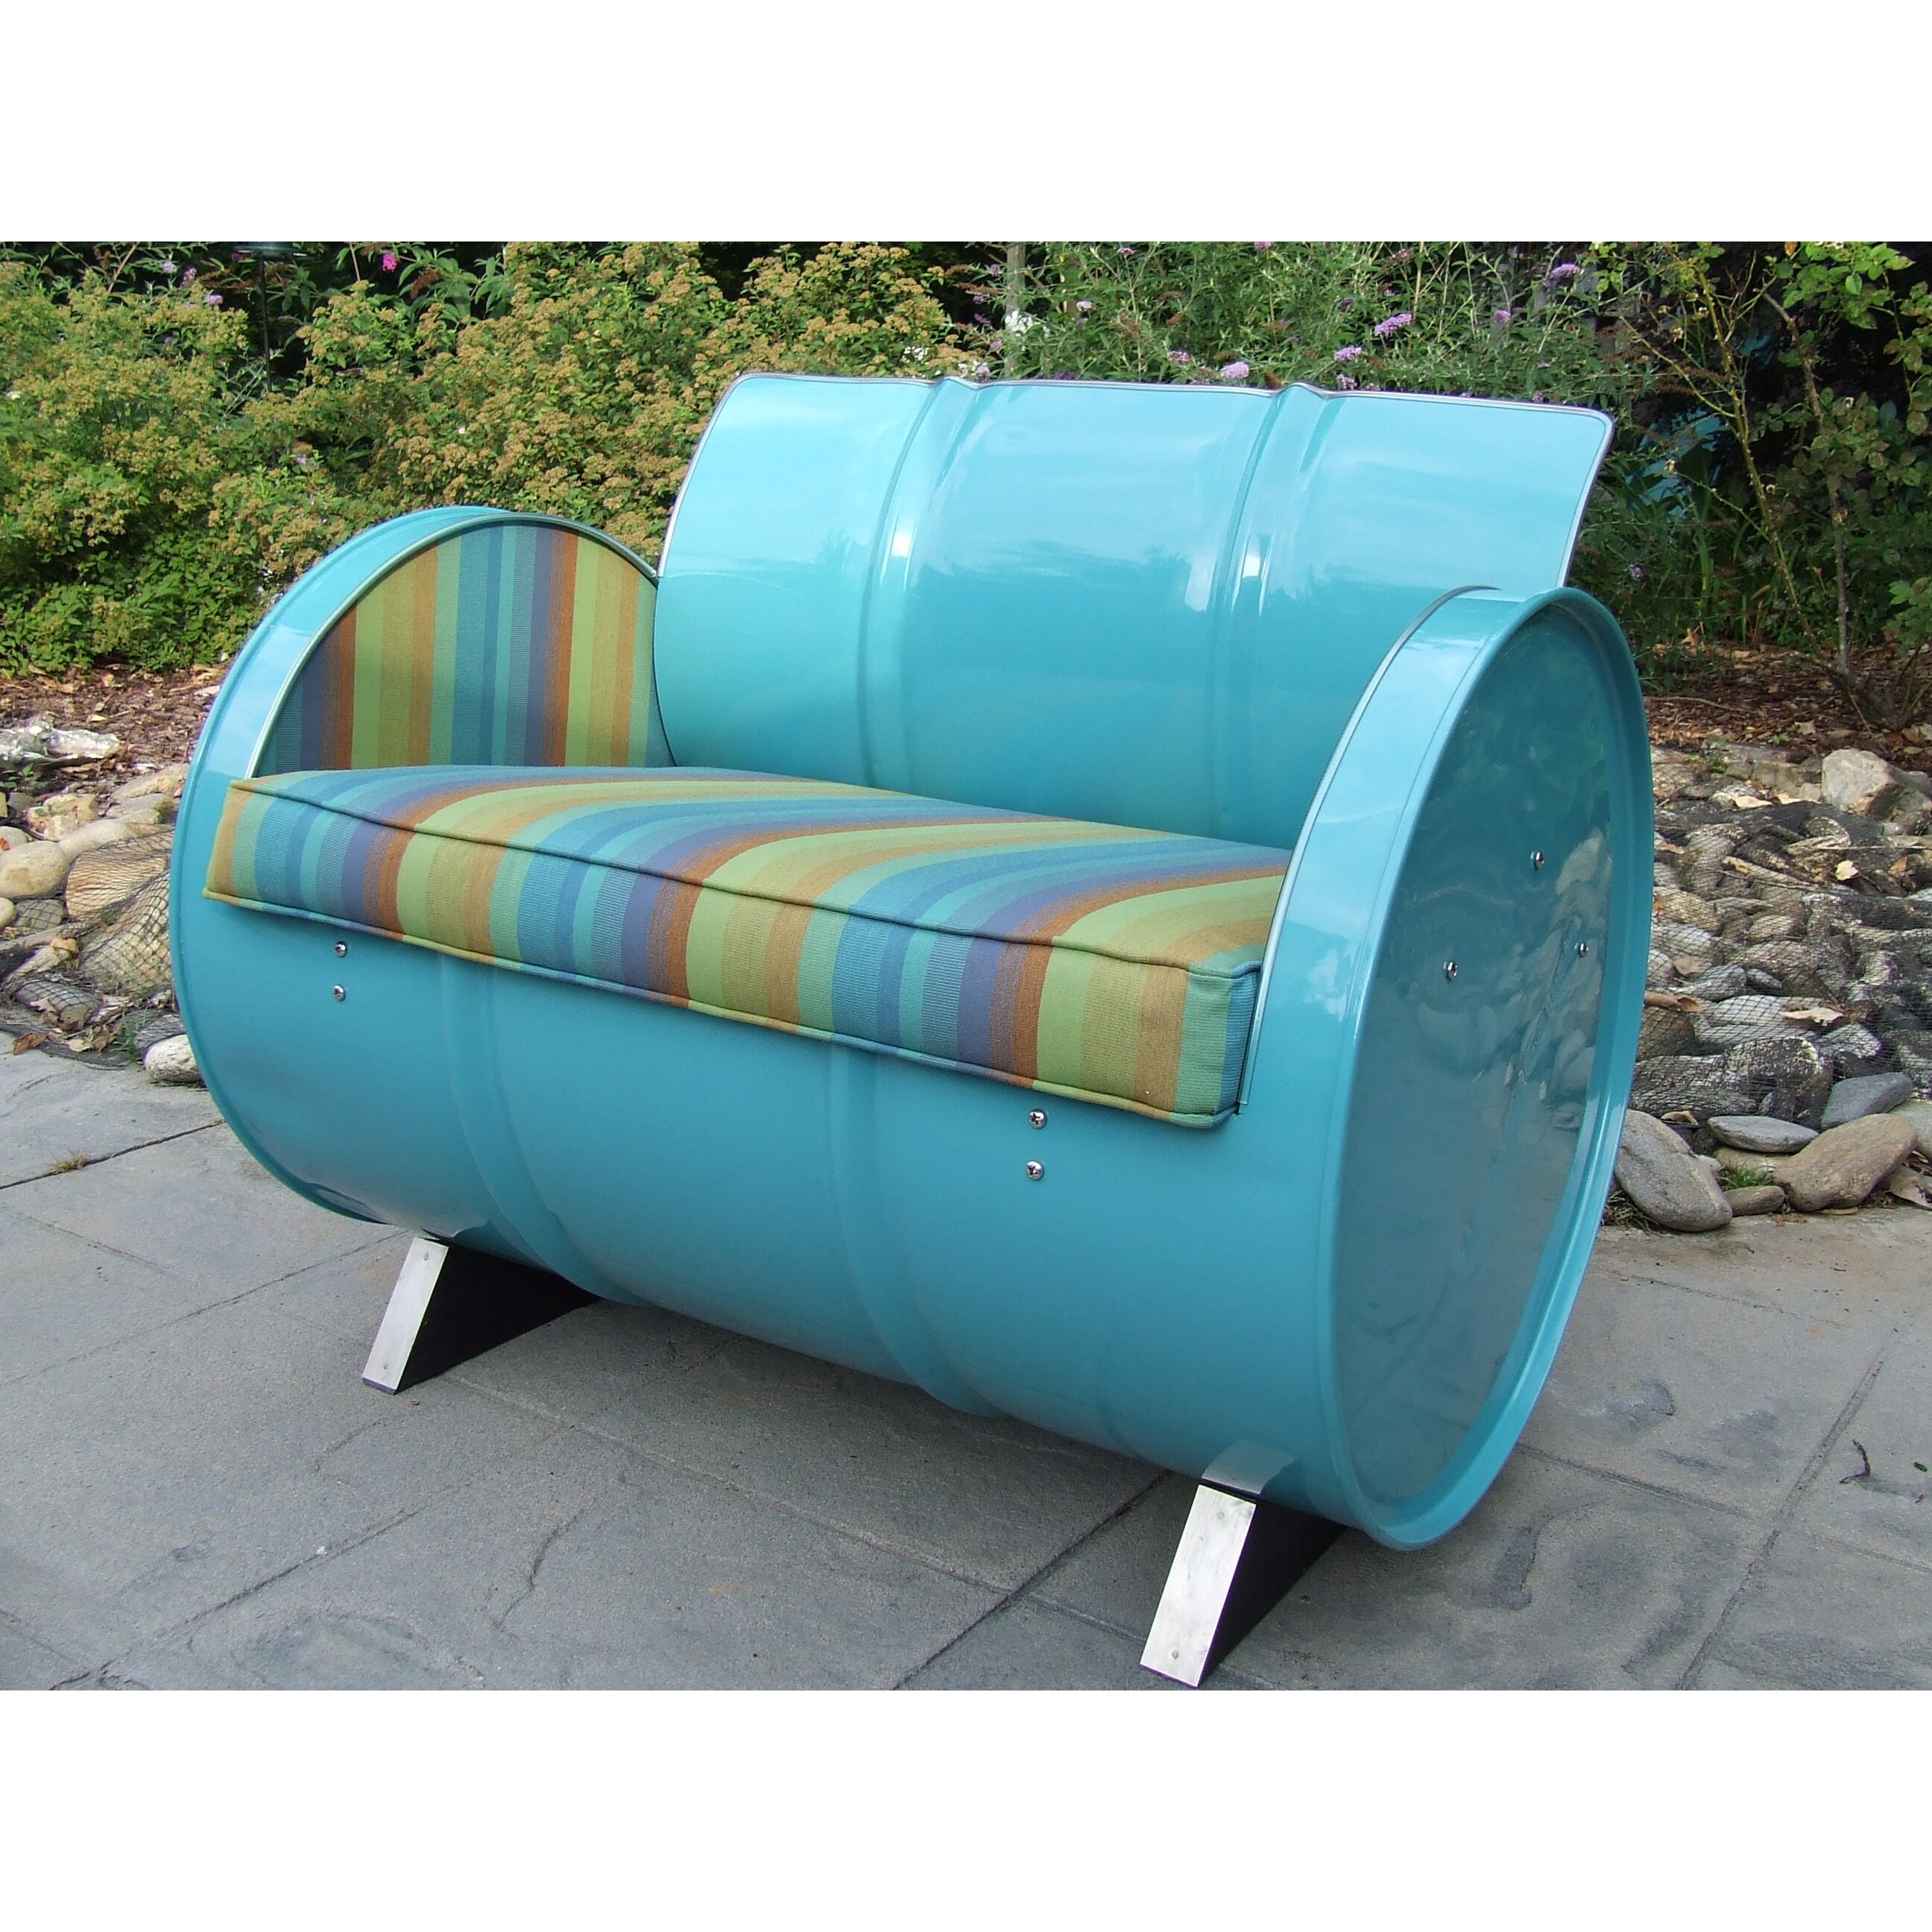 Drum works furniture astoria lagoon indoor outdoor for Indoor outdoor furniture